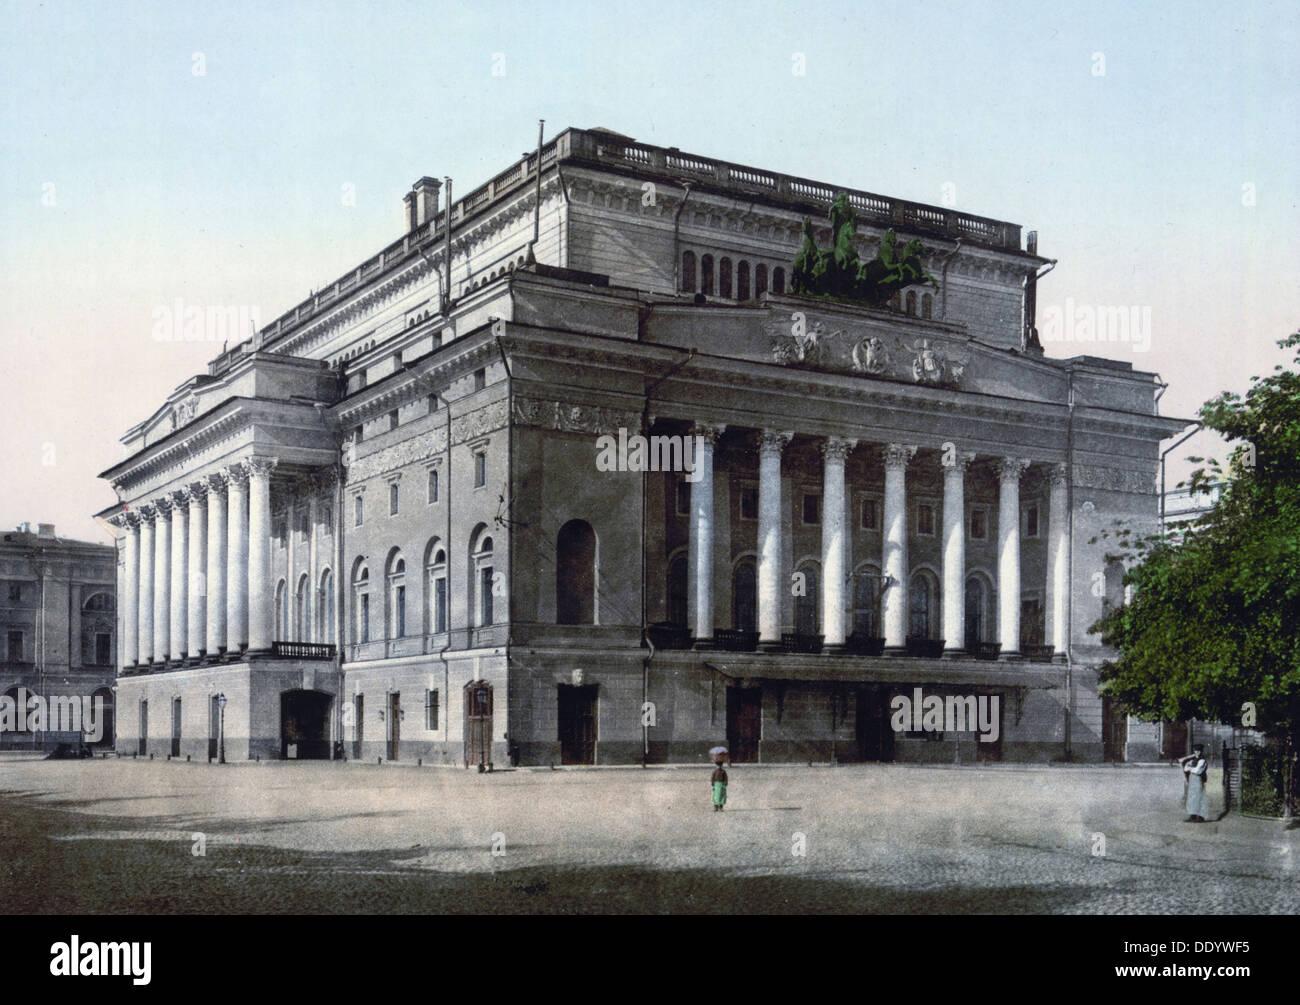 The Alexandrinsky Theatre, St Petersburg, Russia, c1890-c1905. Artist: Anon Stock Photo